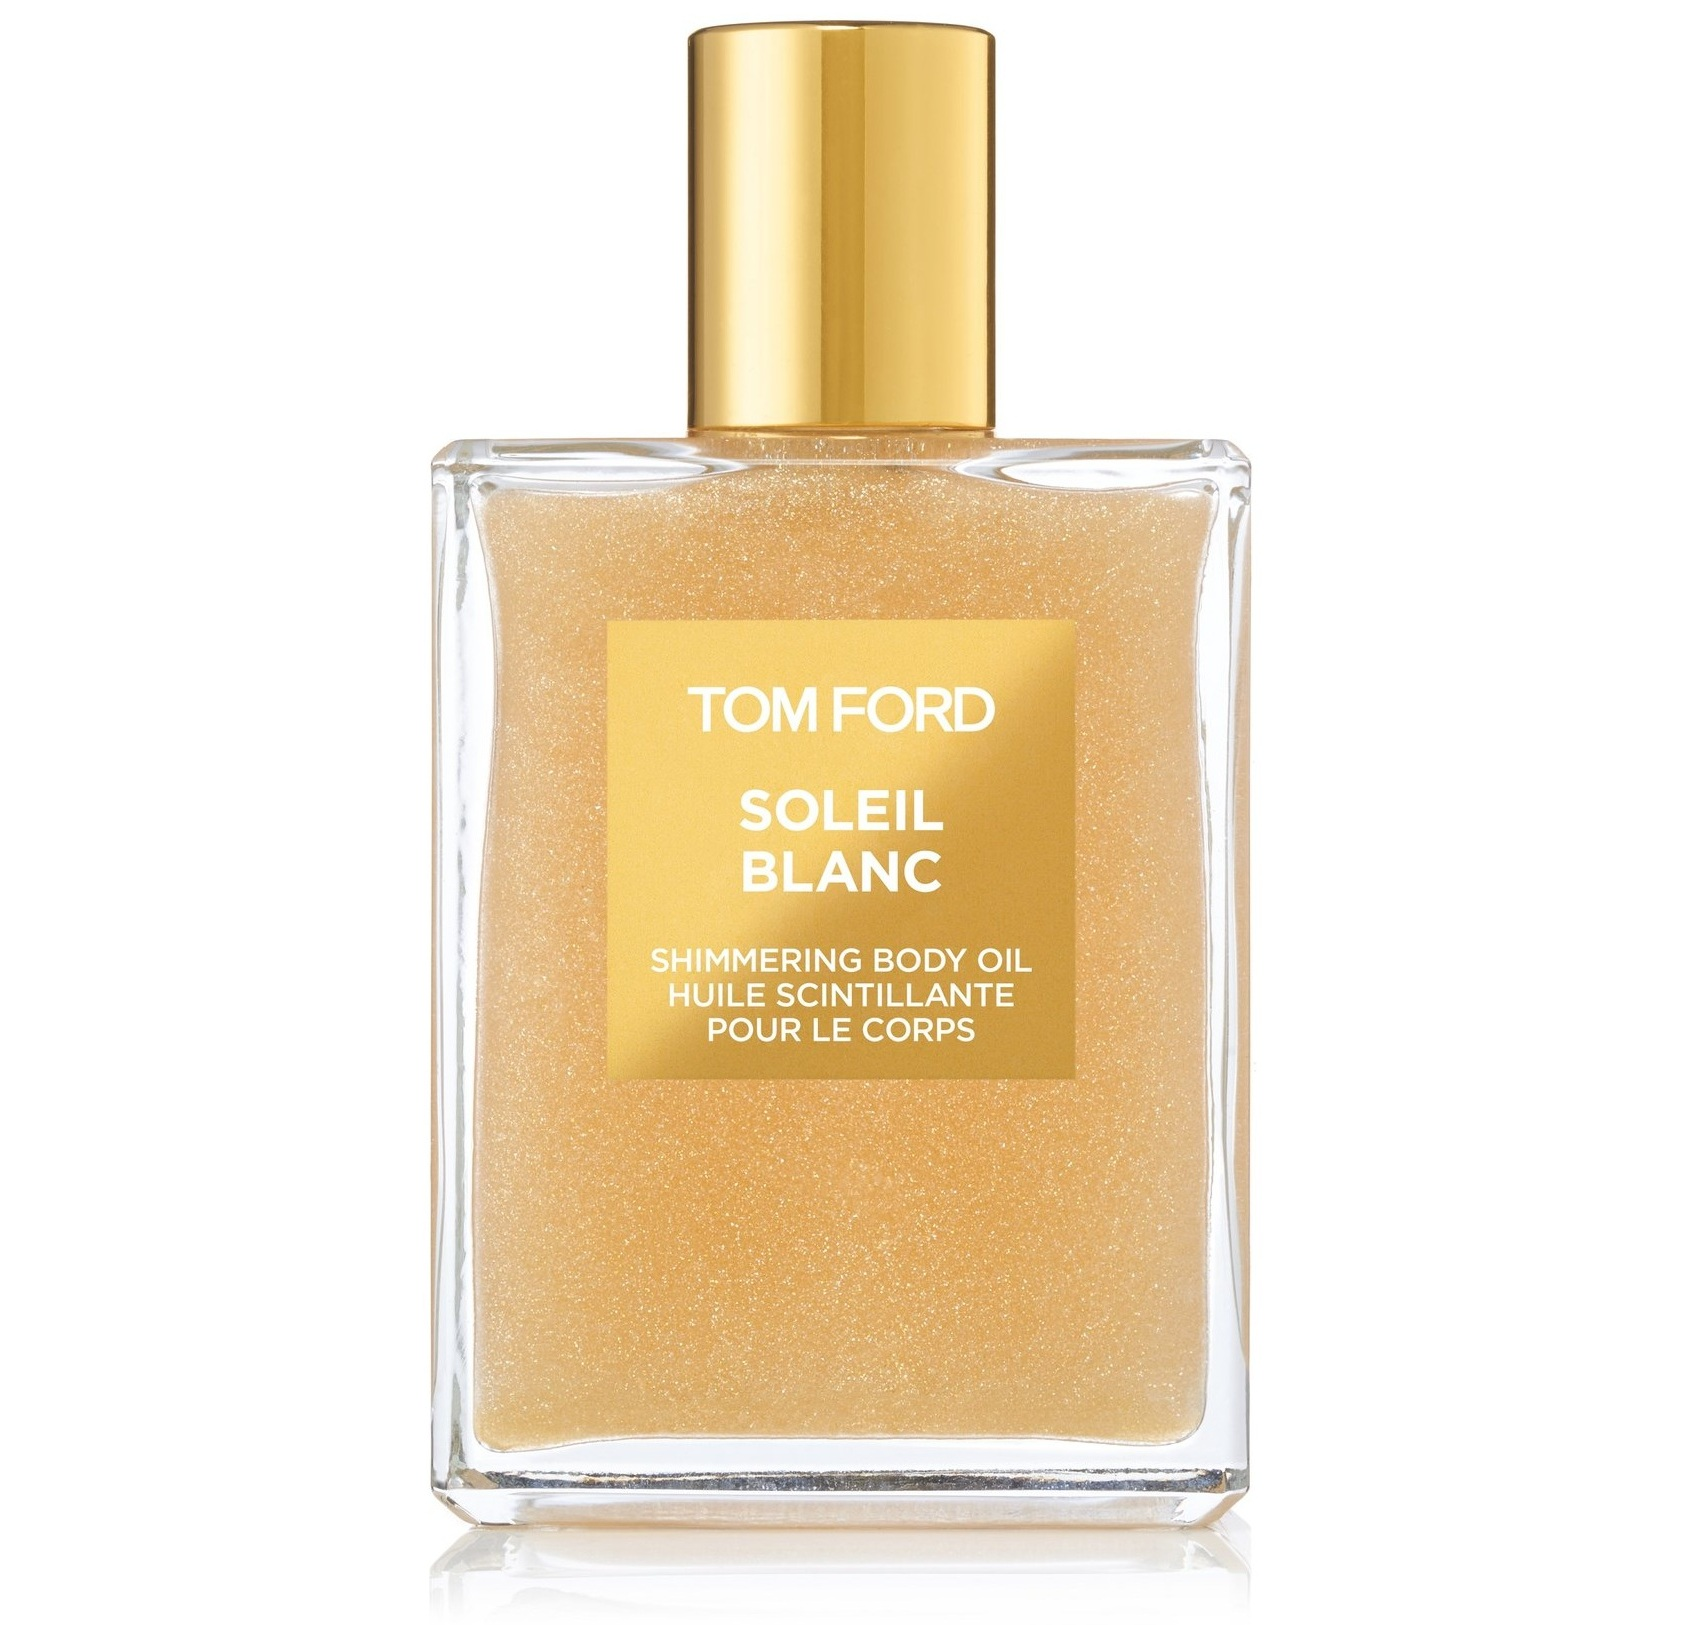 Soleil Blanc Shimmering Body Oil,    Tom Ford   , £72